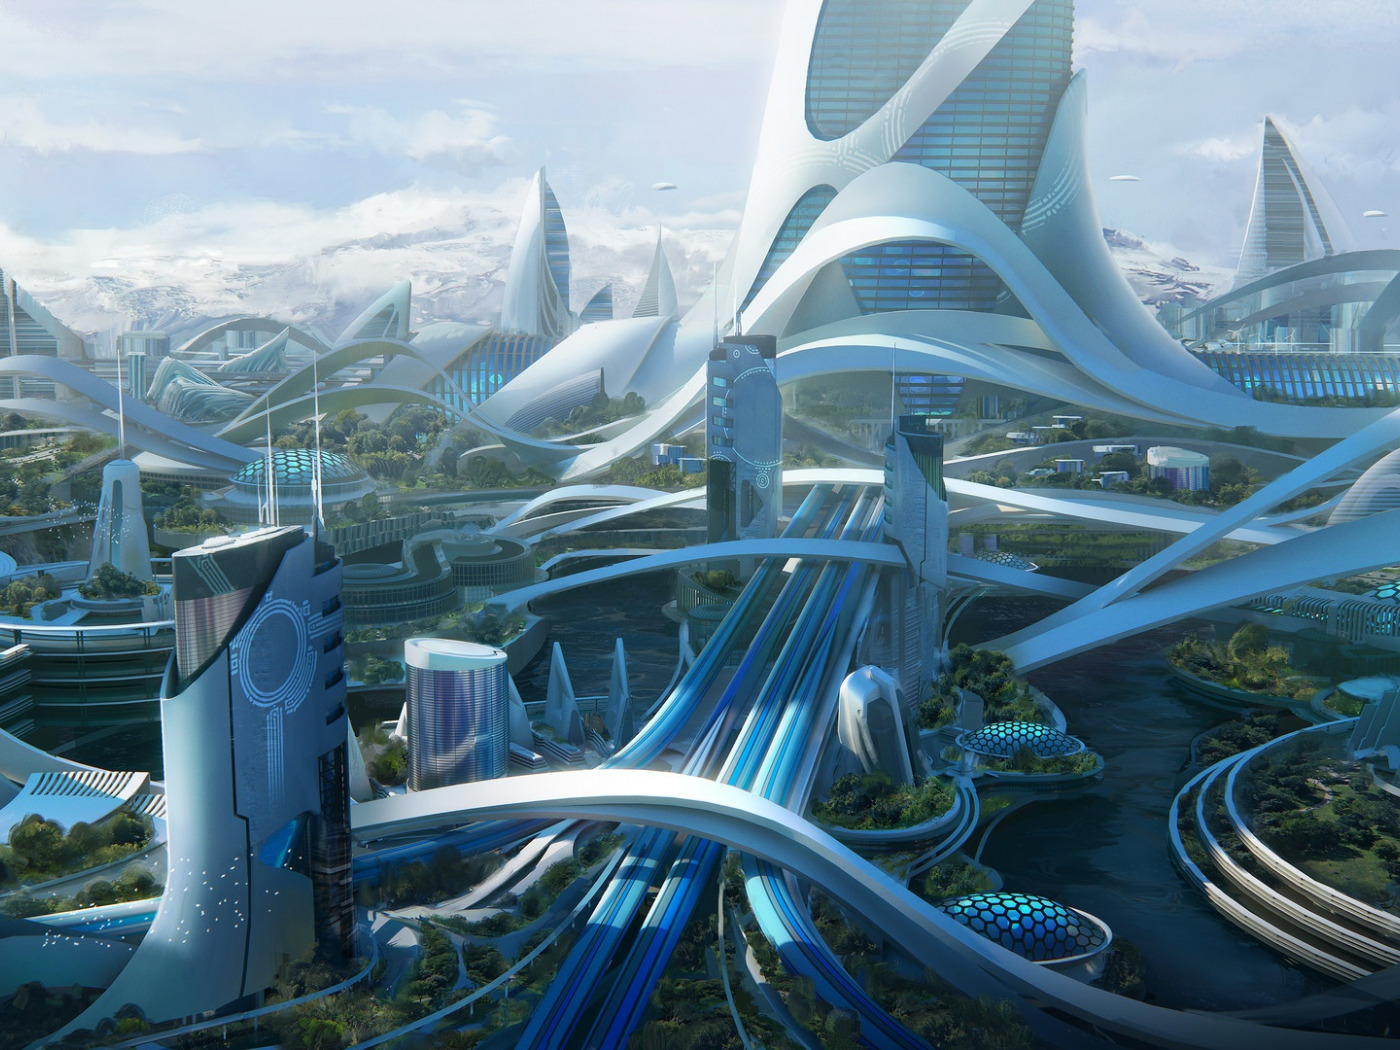 https://img4.goodfon.ru/original/1400x1050/2/1d/kitbash-3d-utopia-set-cover-sooruzheniia-arkhitektura-gory.jpg